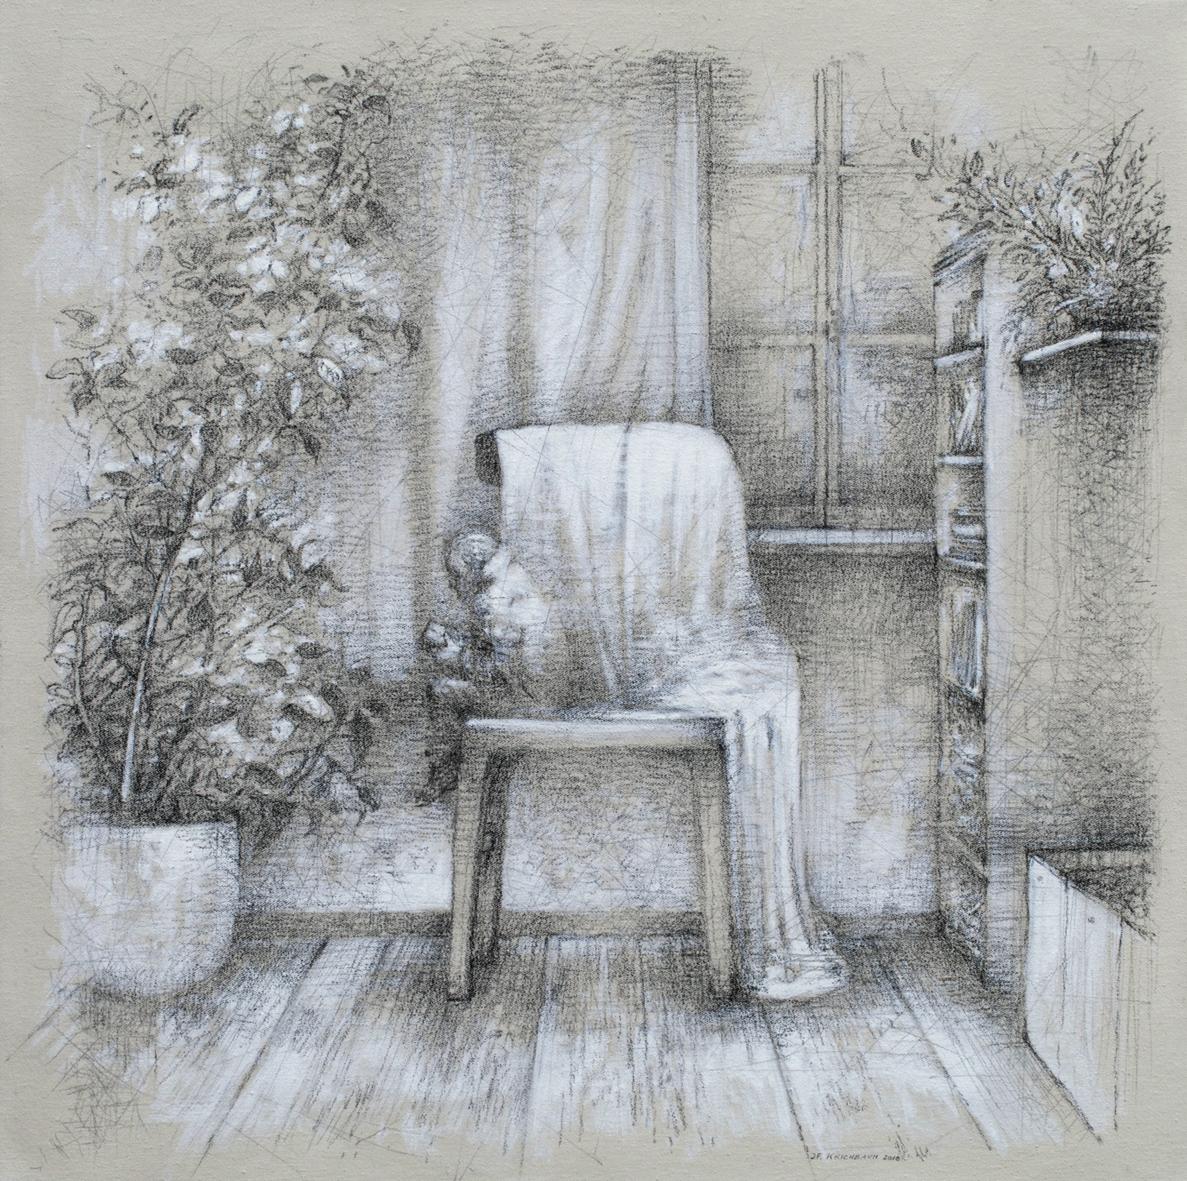 The Day When He Felt Very Small by Josef Florian Krichbaum